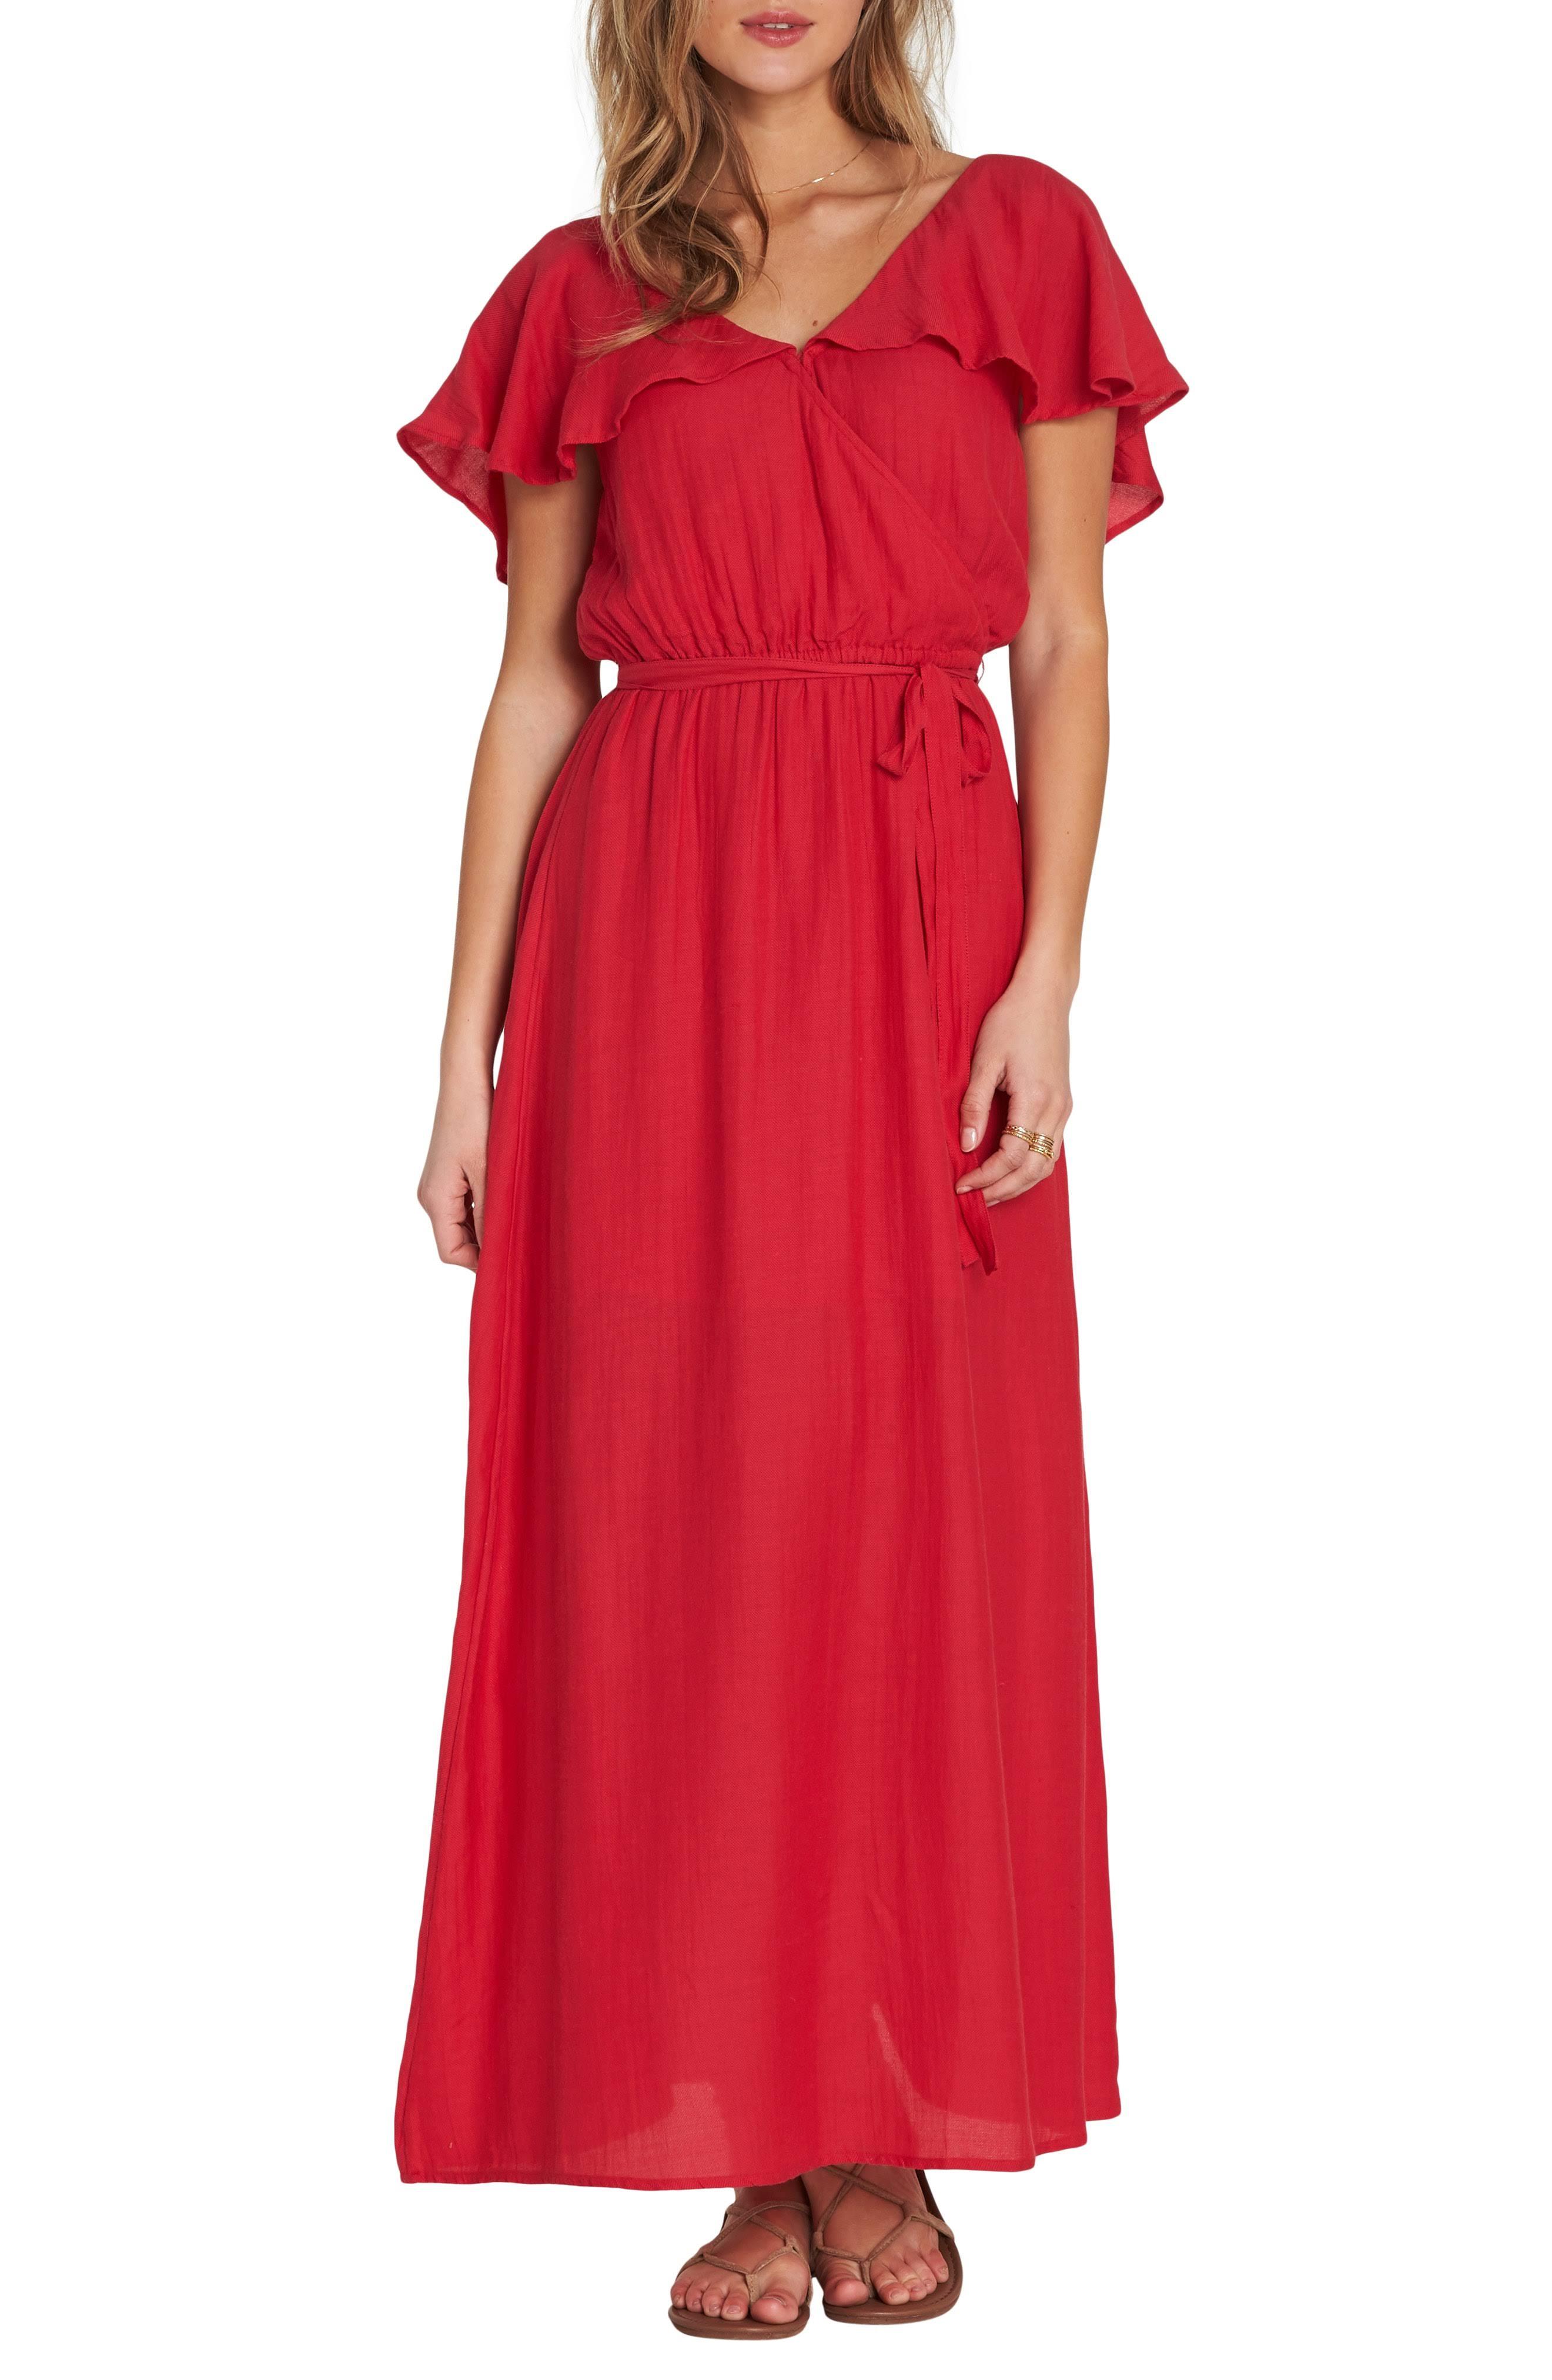 Para Dance Largo All Night Granate Vestido Knit Mujer Xs Billabong xSwqYdX5S